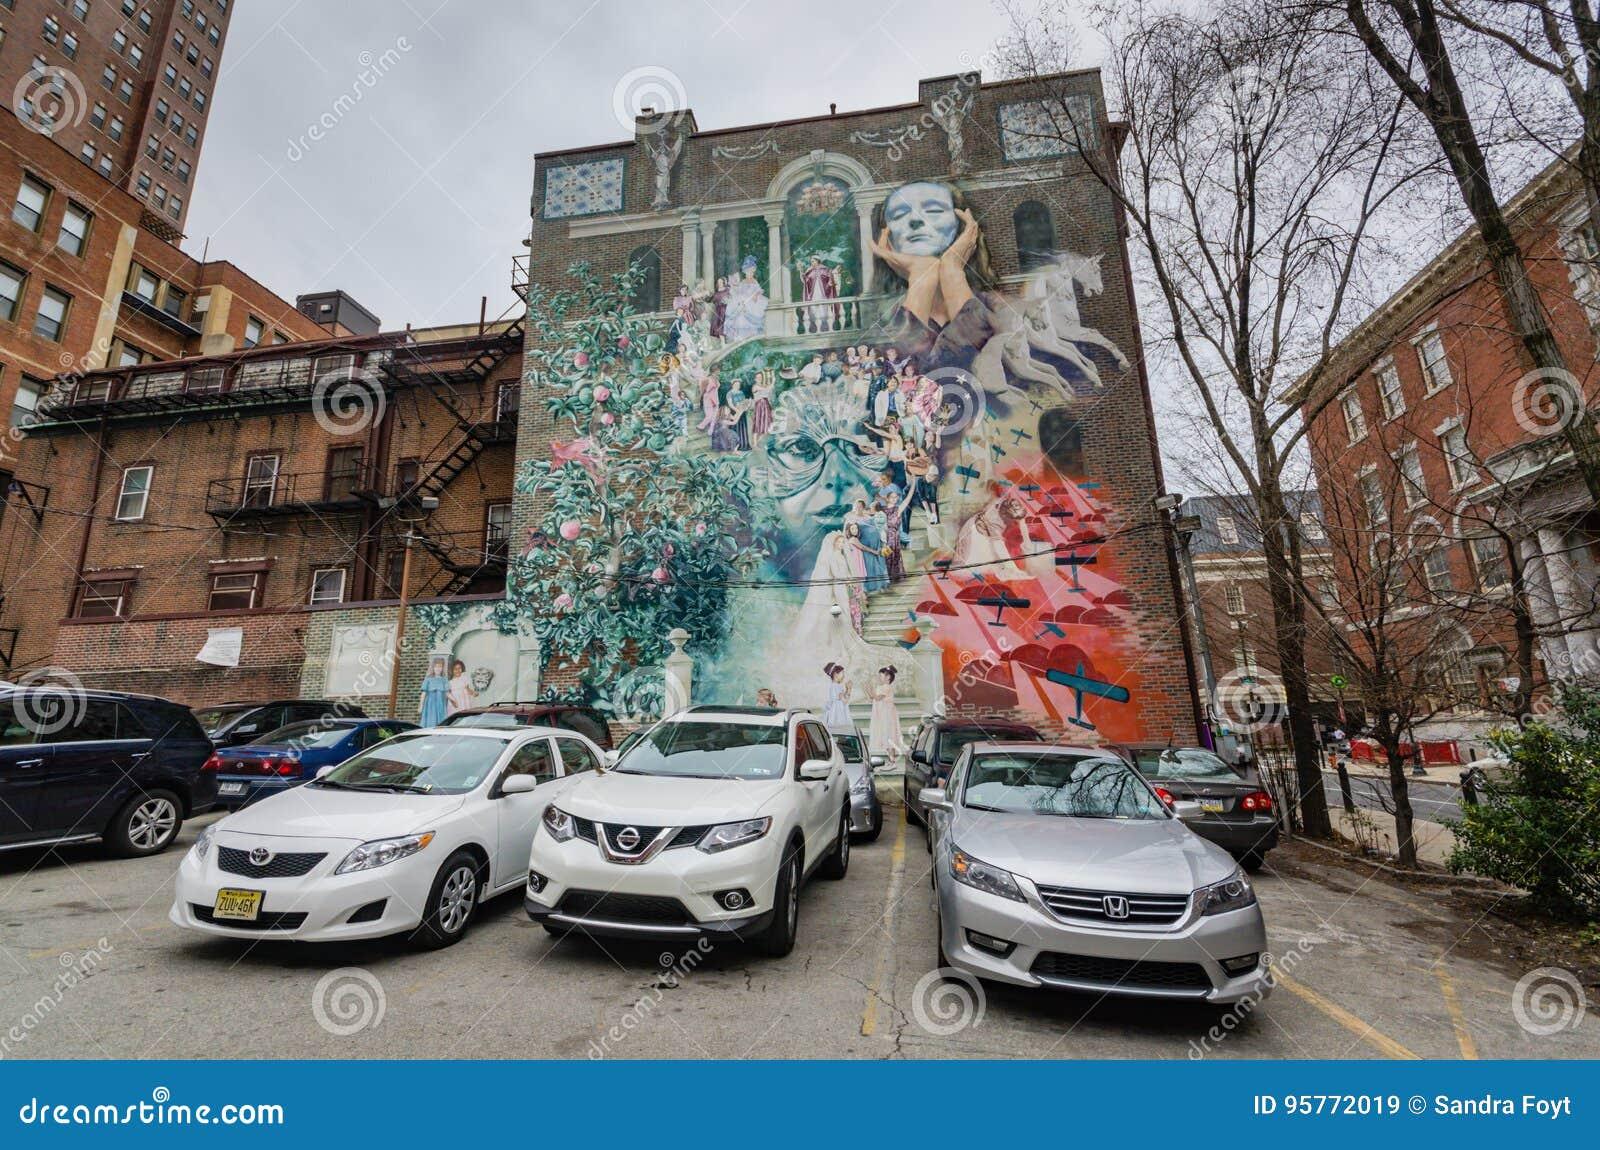 Mural Arts Philadelphia - Pennsylvania